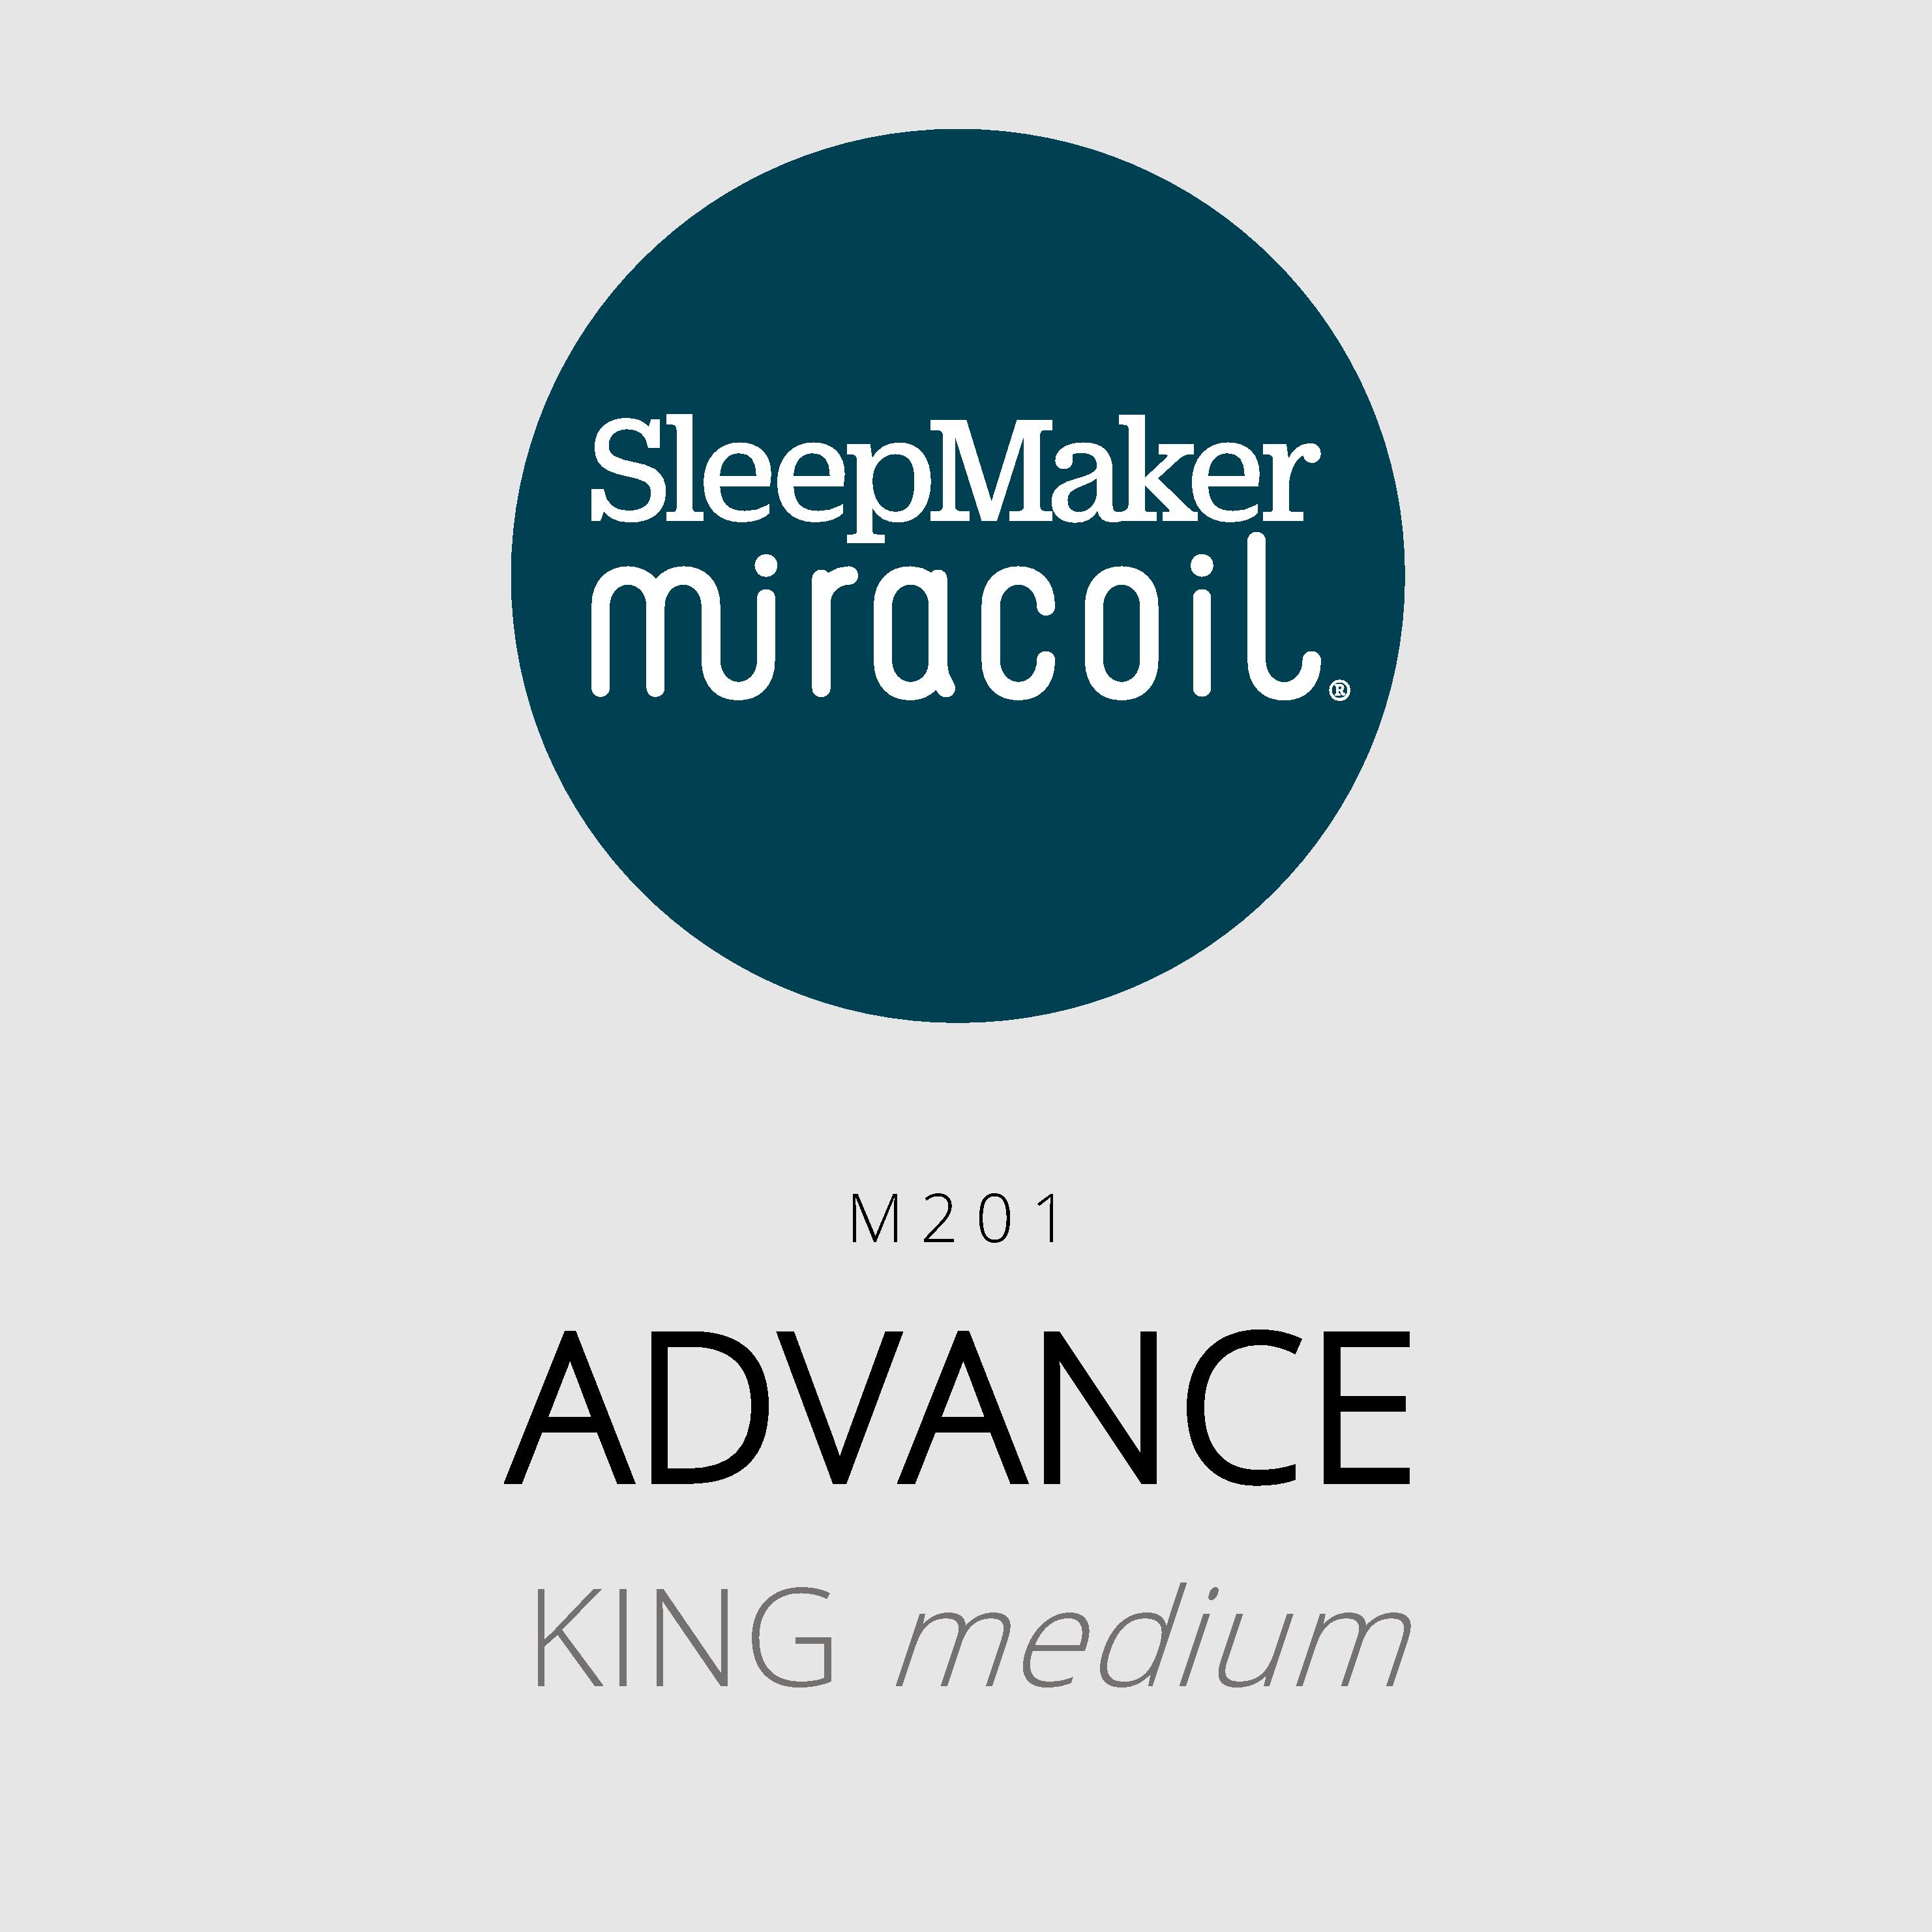 SleepMaker Miracoil – Advance – M201 – King Medium Mattress